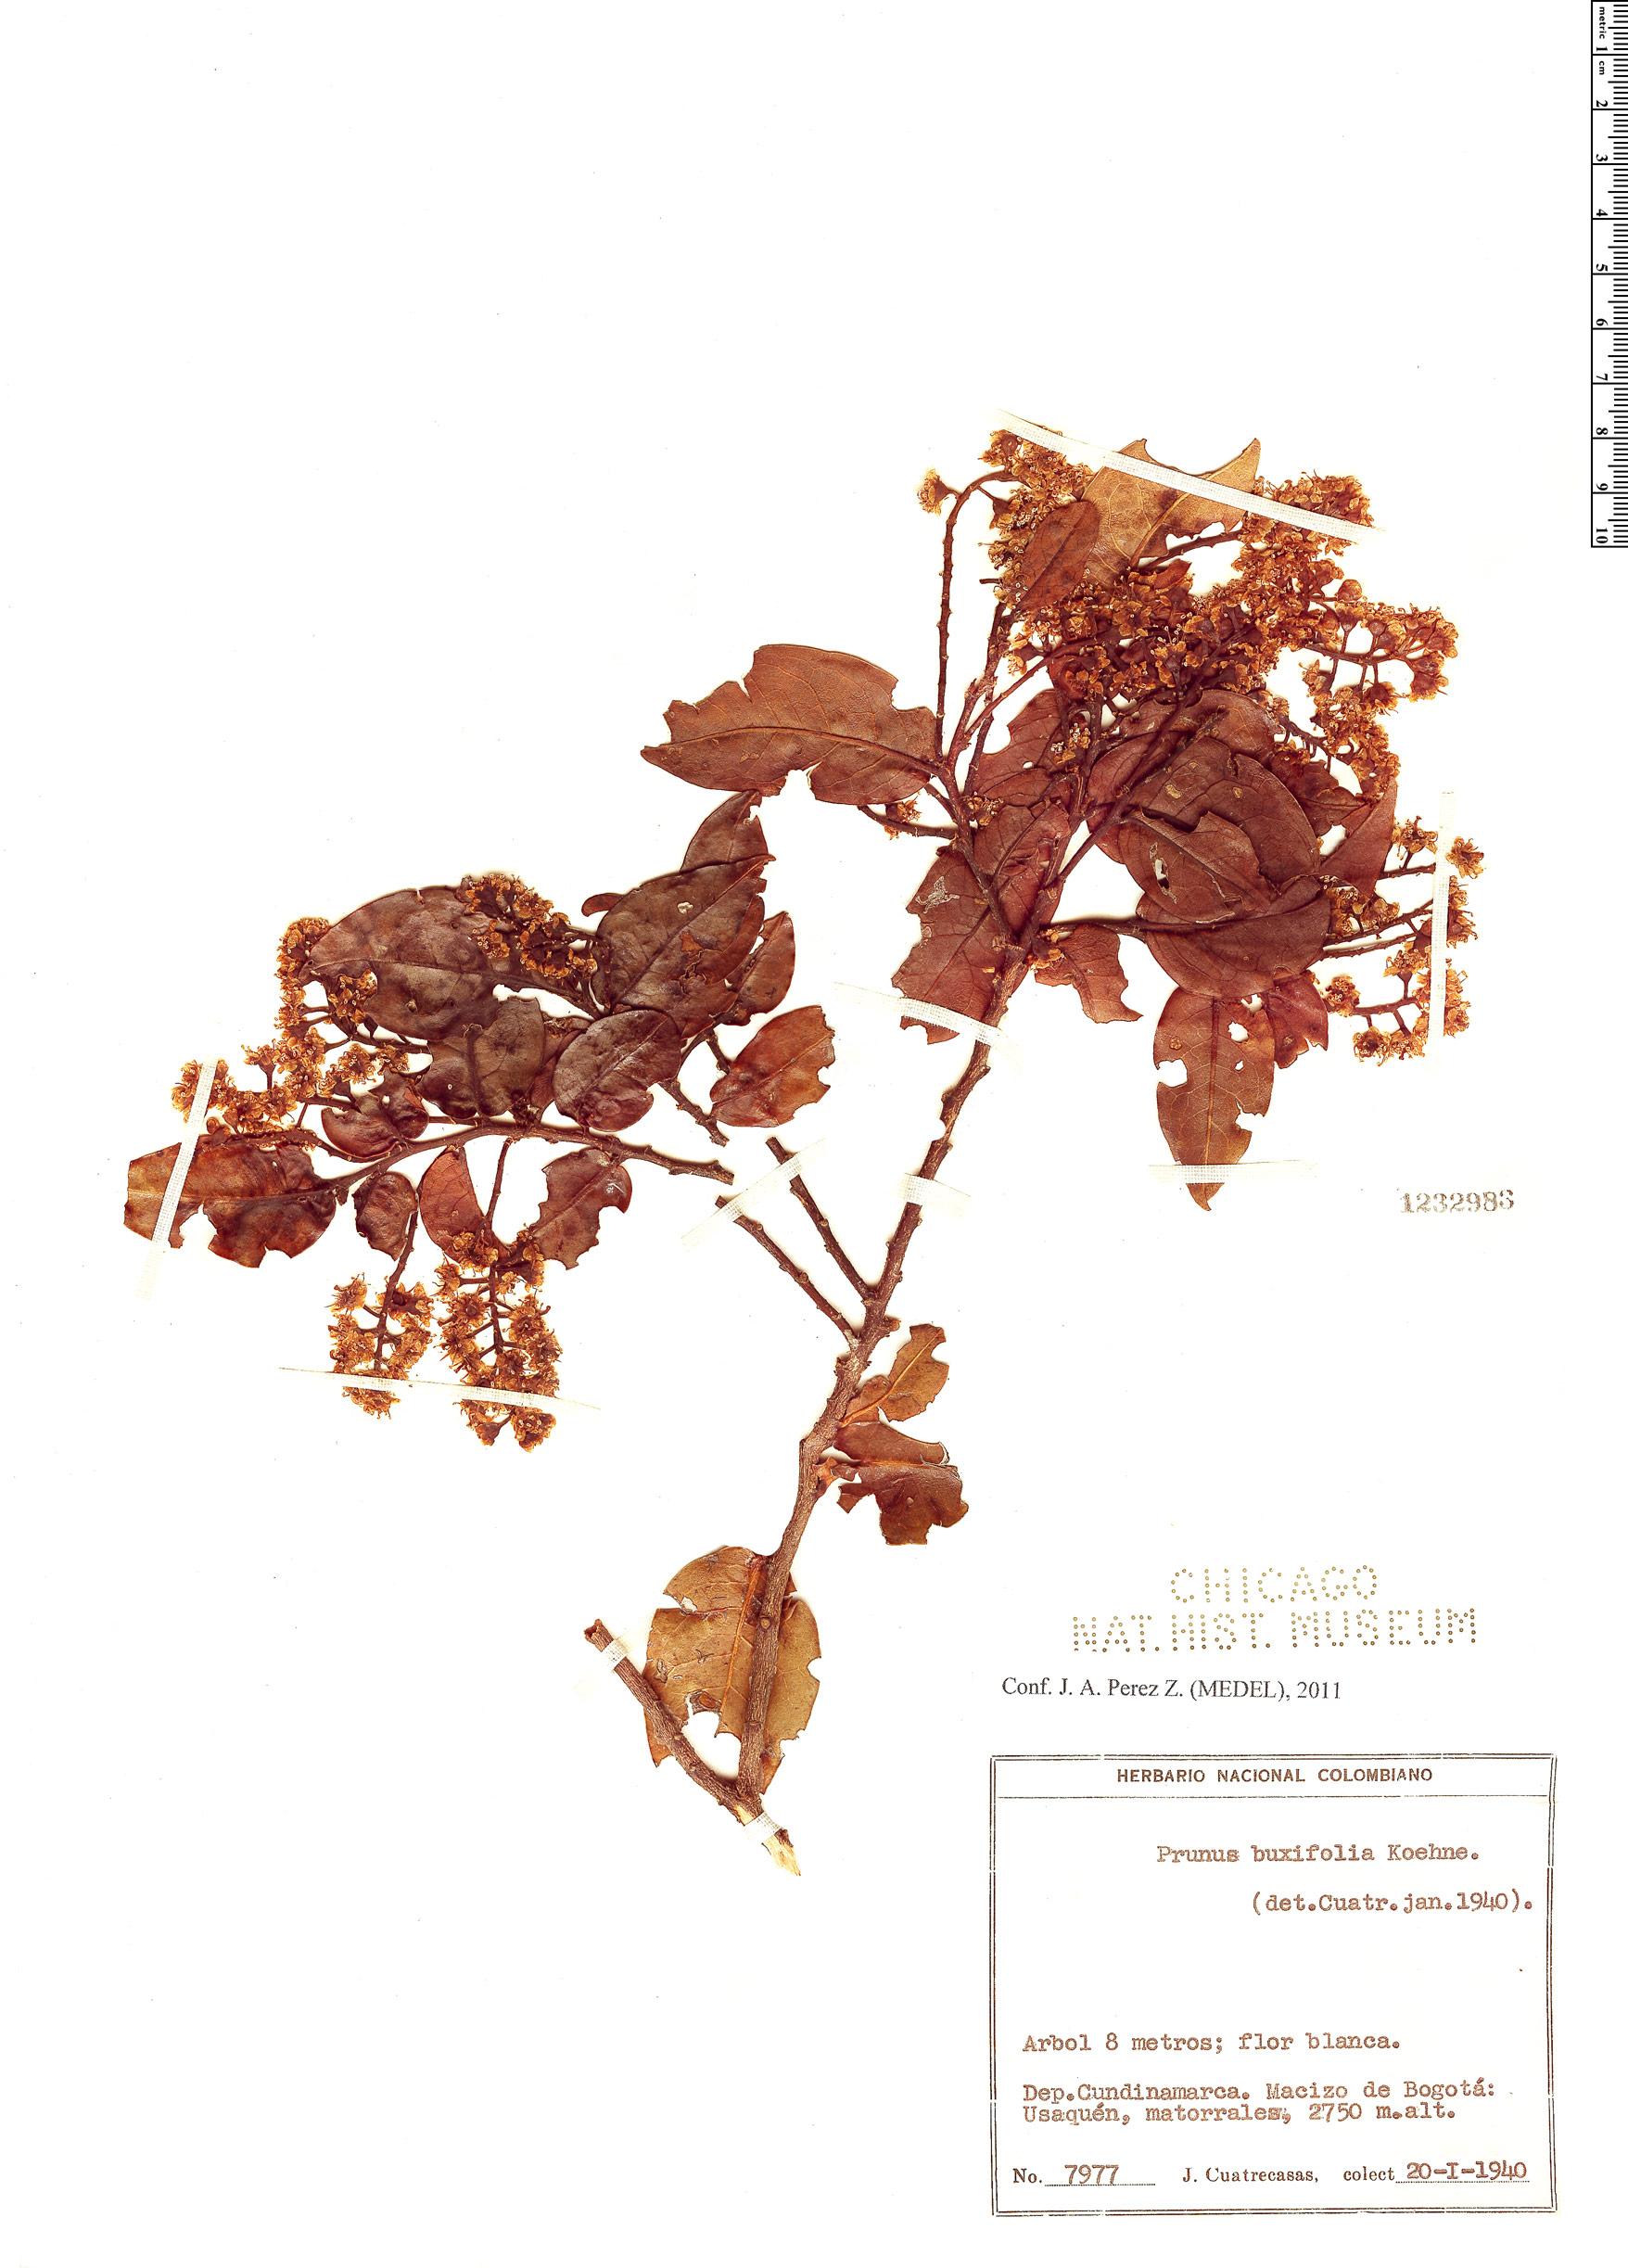 Espécimen: Prunus buxifolia